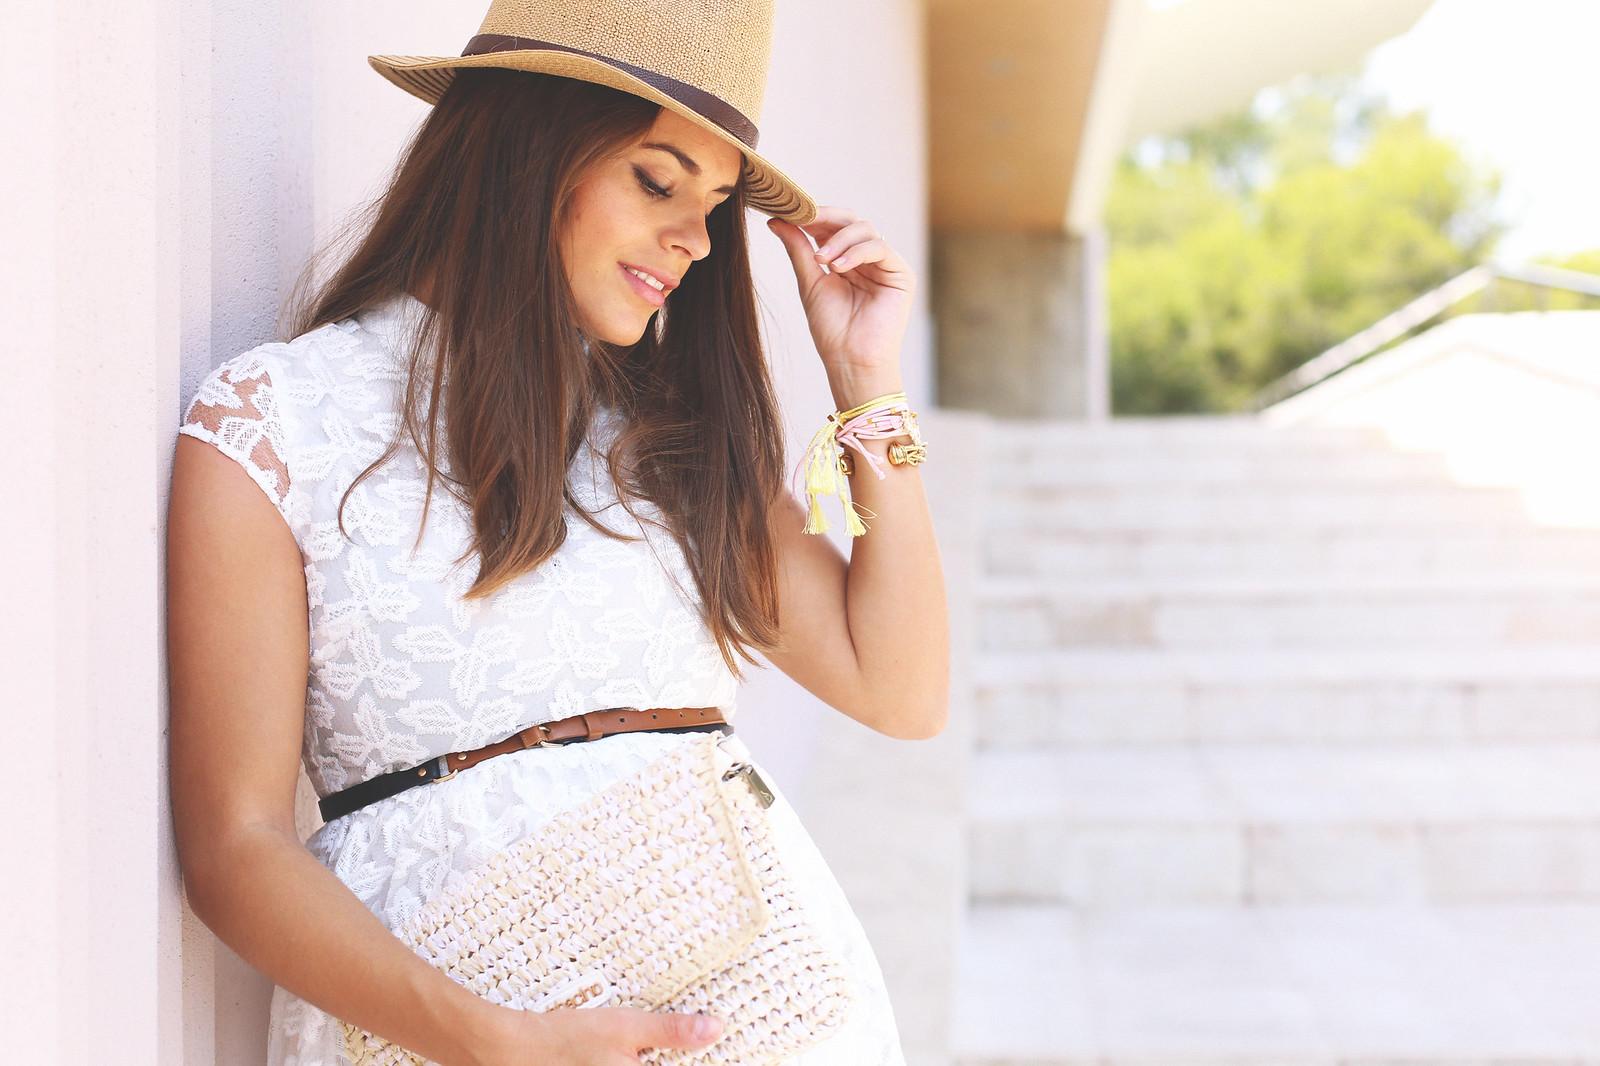 8. lace white short dress - jessie chanes - pregnancy